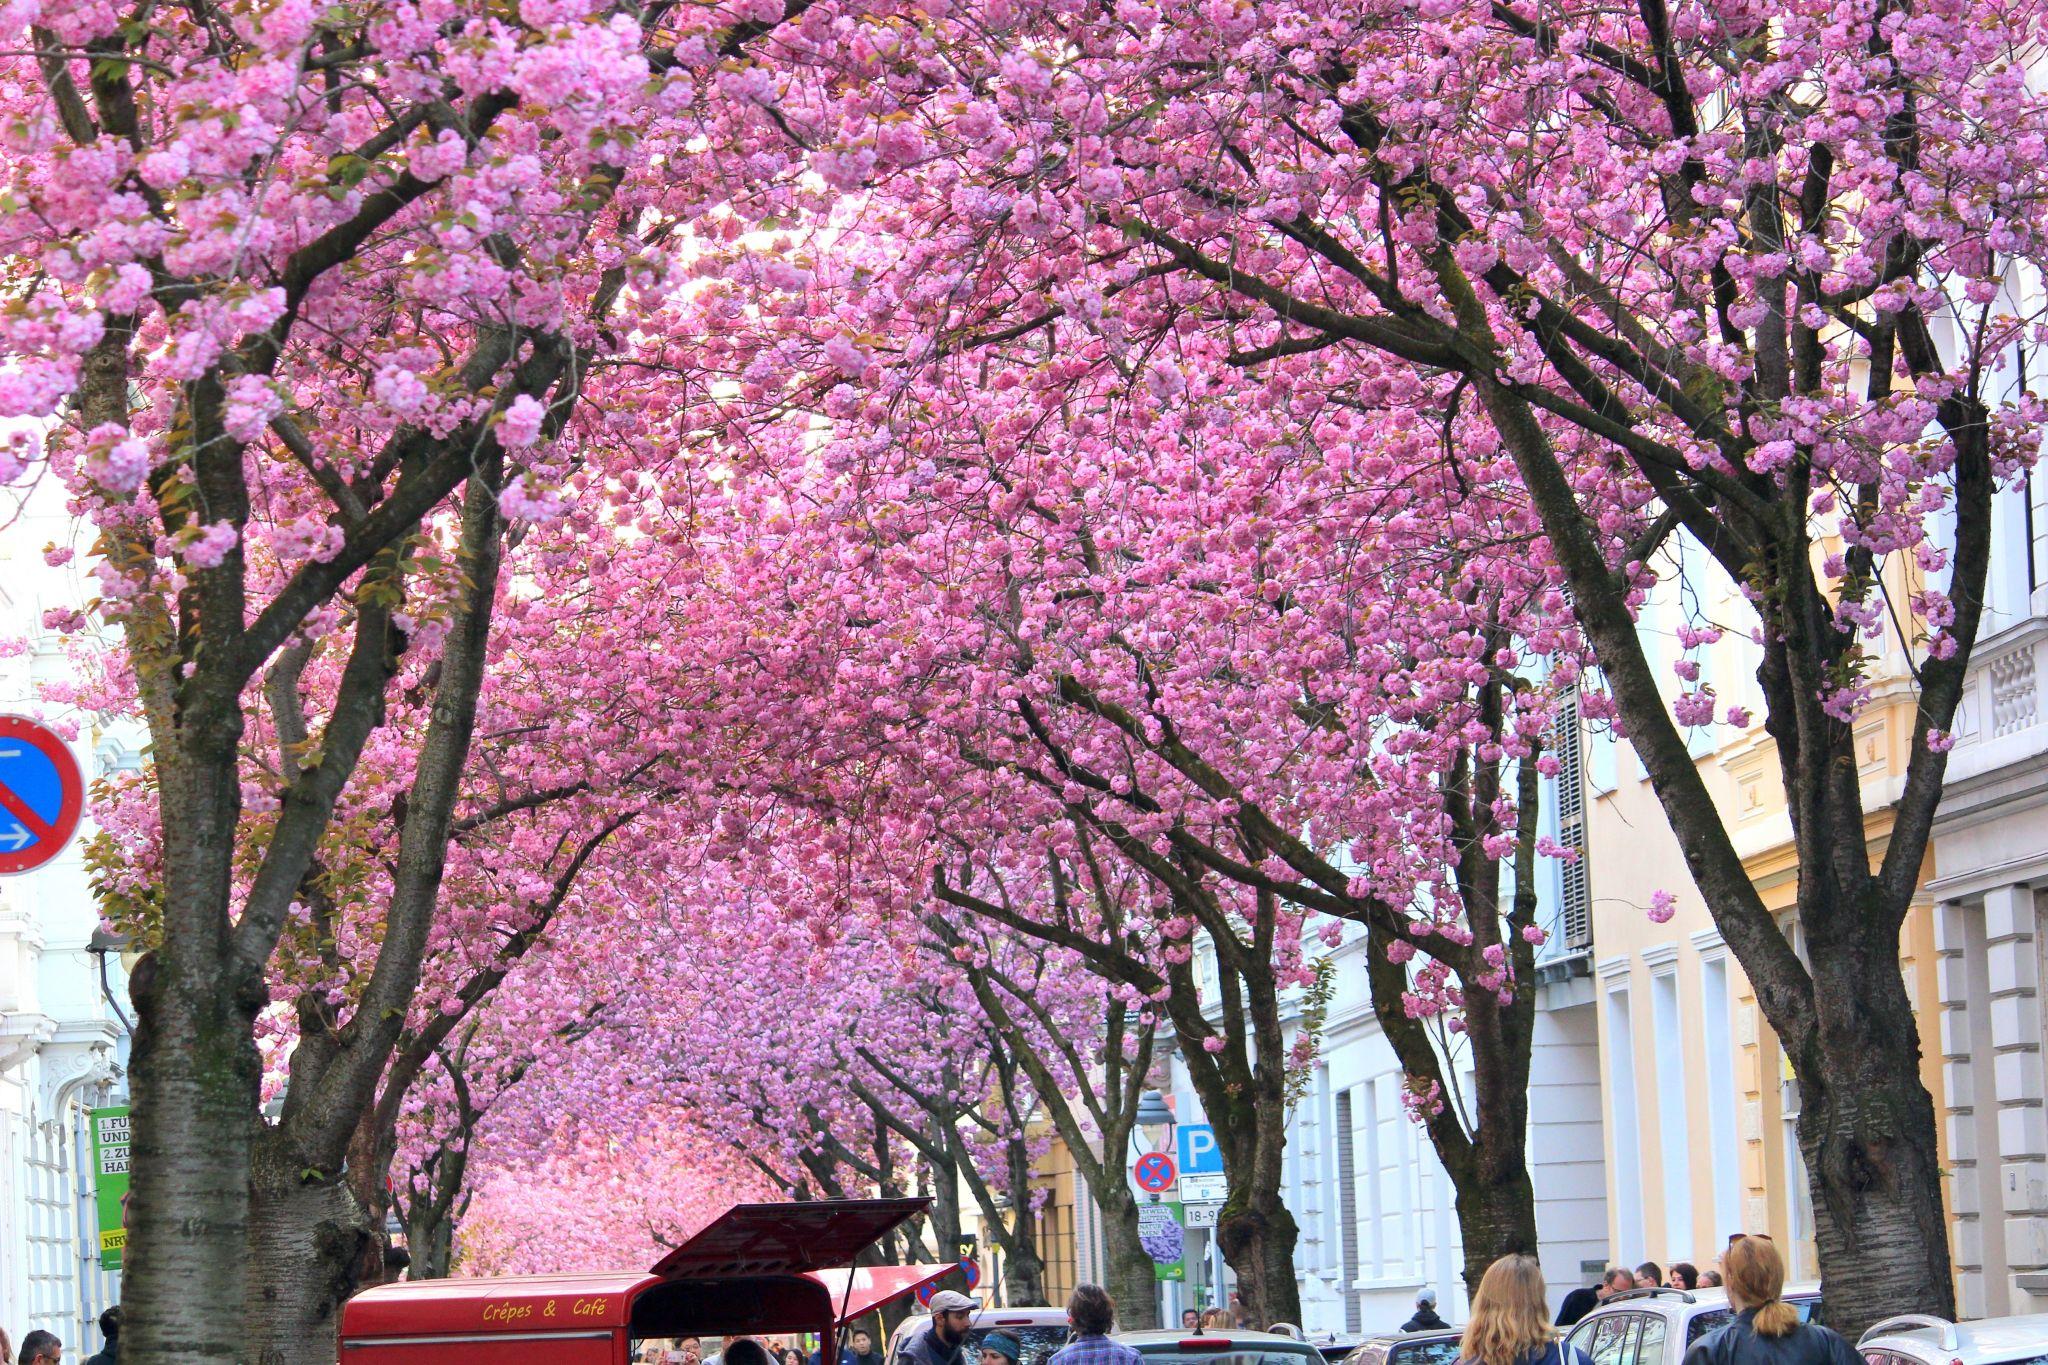 Cherry Blossom Heerstrasse, Bonn, Germany